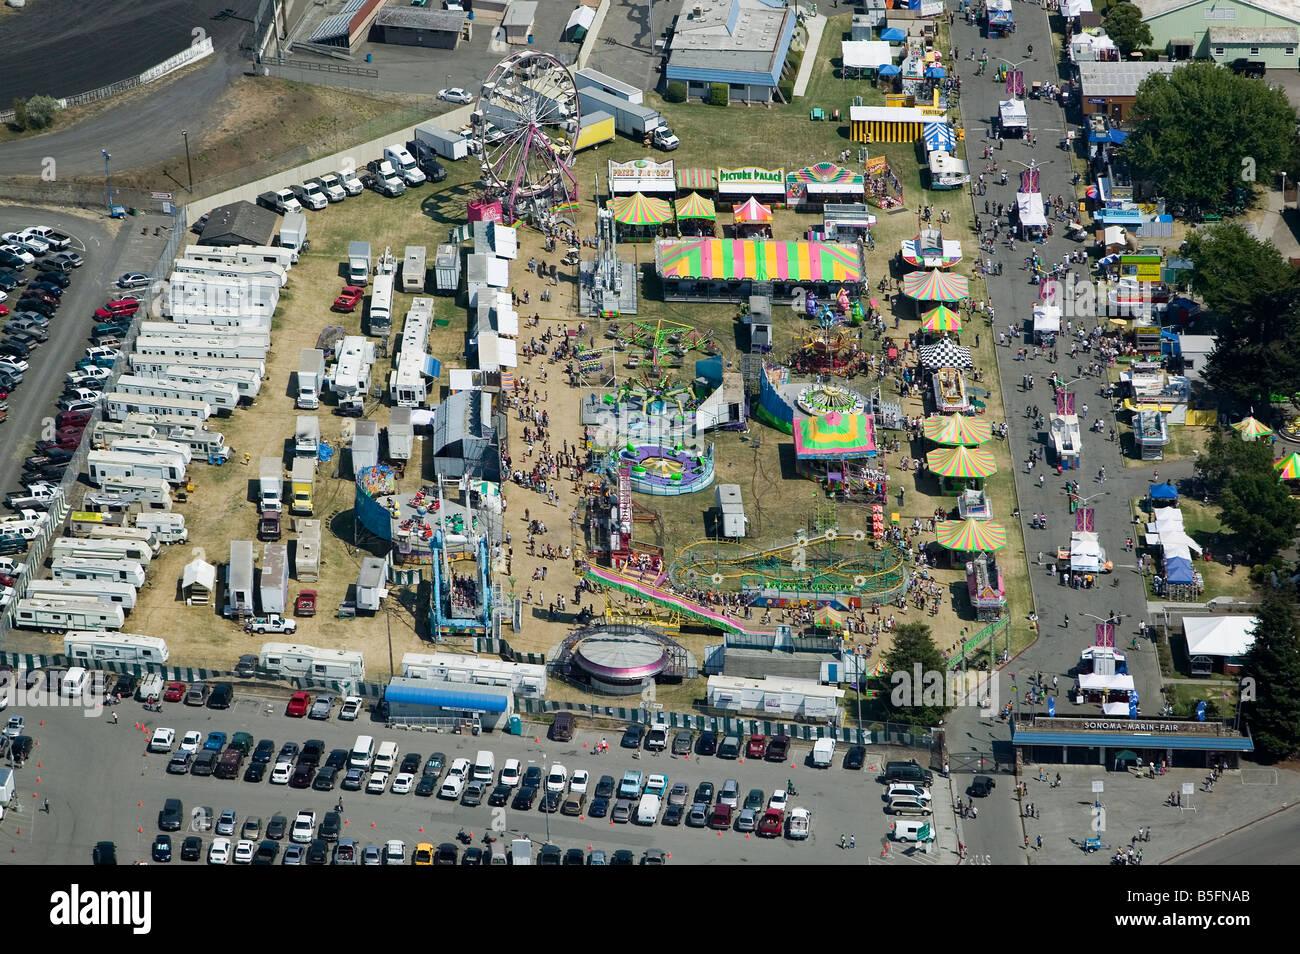 Luftaufnahme über Sonoma Marin County Fair Petaluma, Kalifornien Stockbild